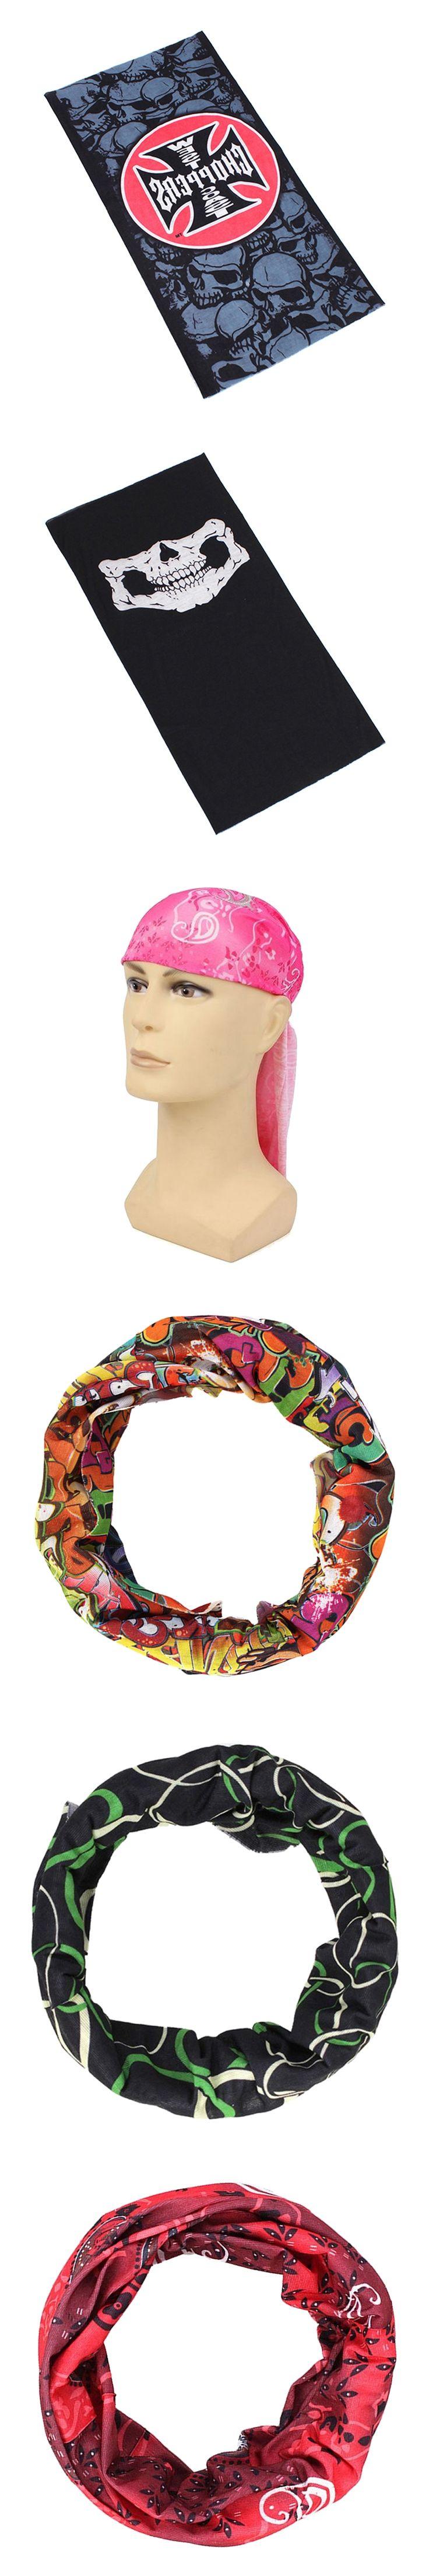 Multifunction scarf neckerchief headwear headband 12 Colors